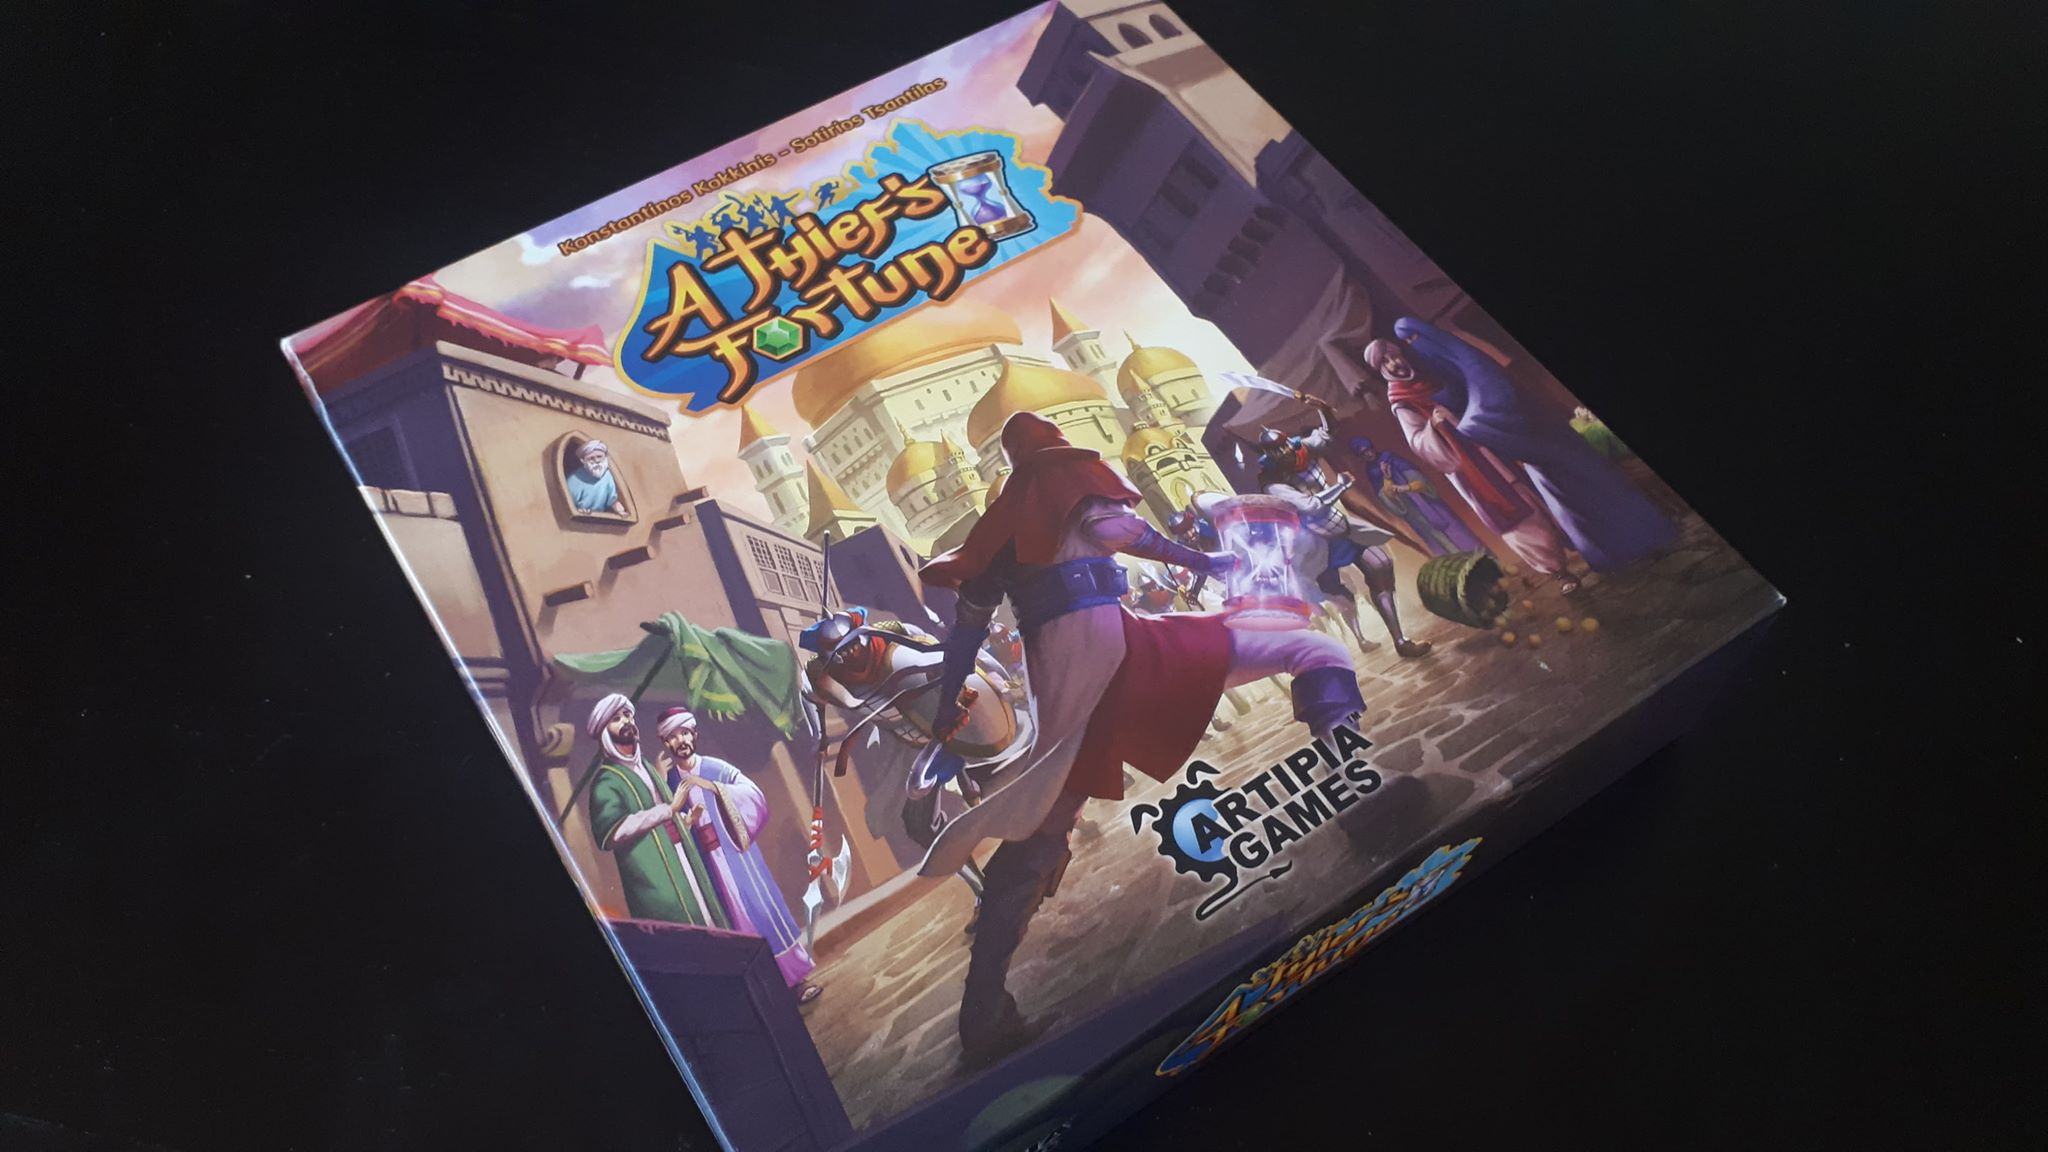 A Thief's Fortune – Трето поколение драфтинг игра